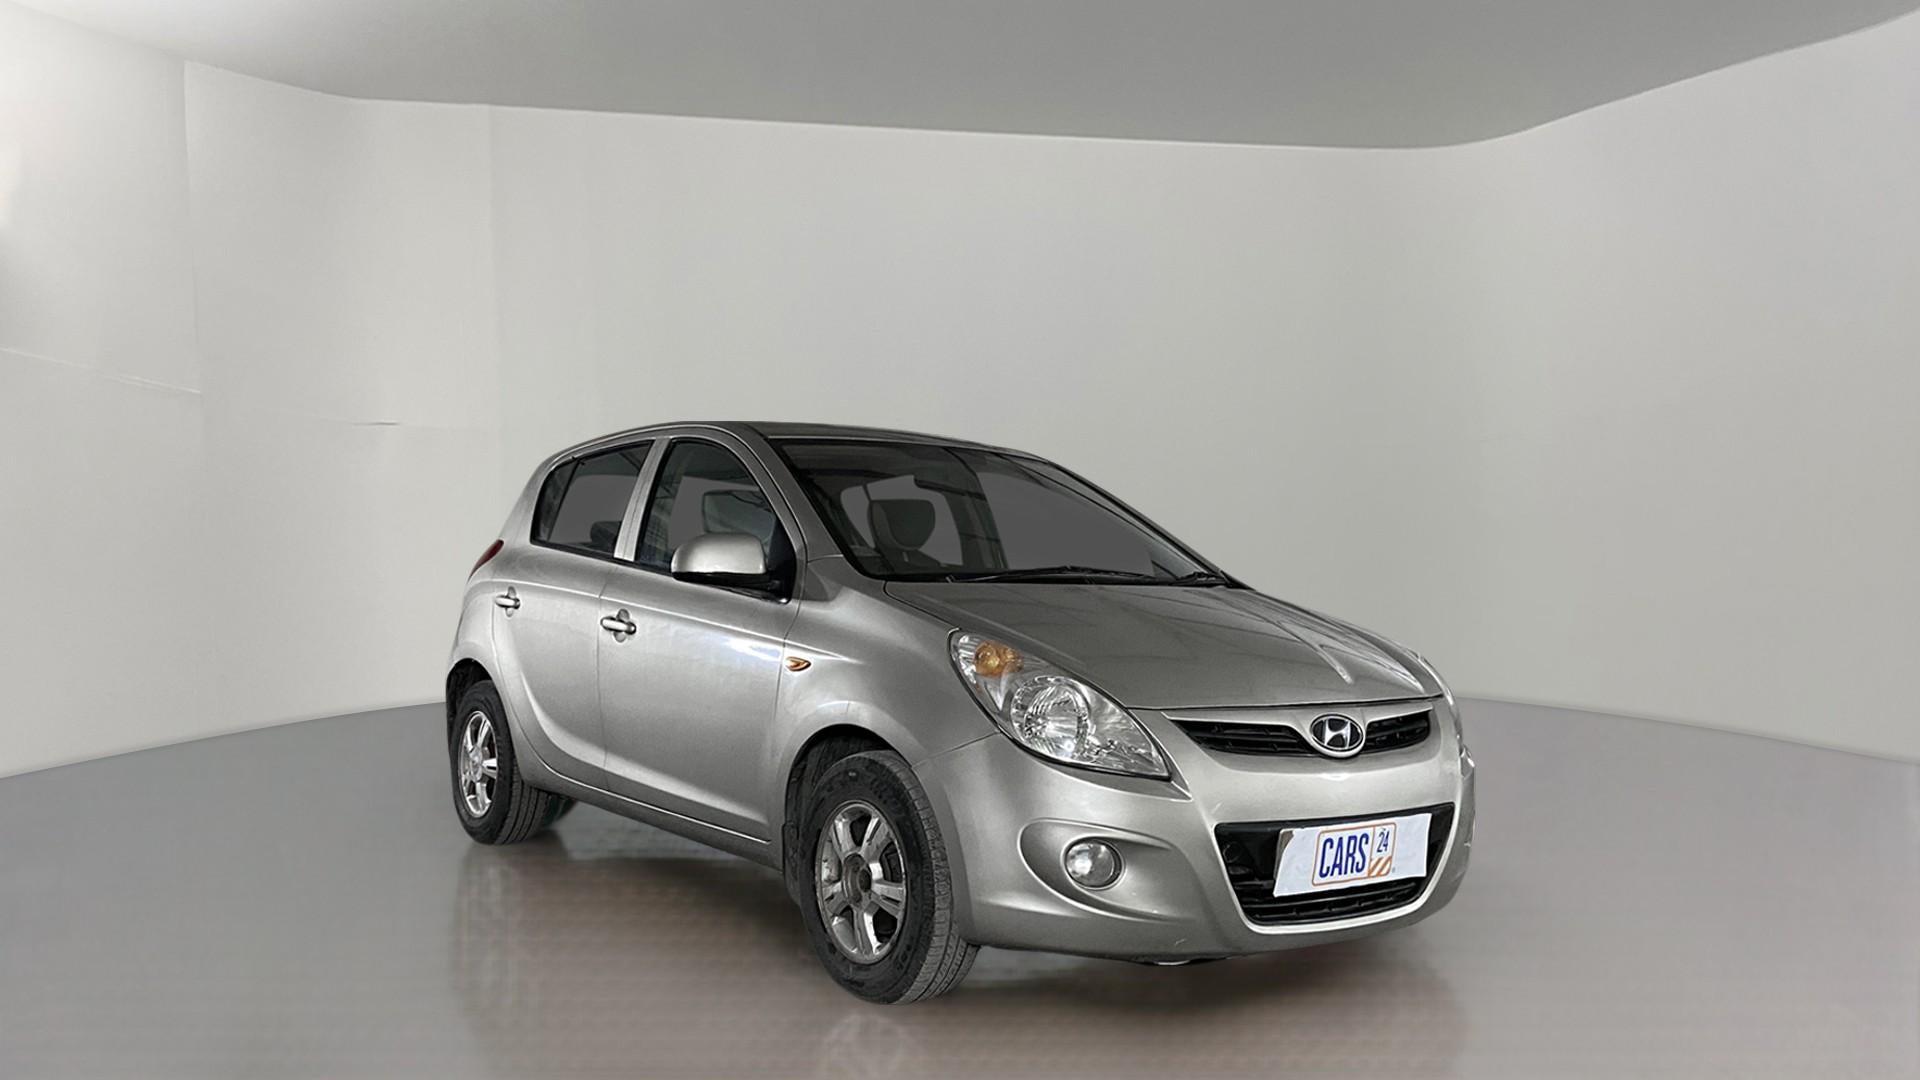 2009 Hyundai i20 ASTA 1.4 CRDI